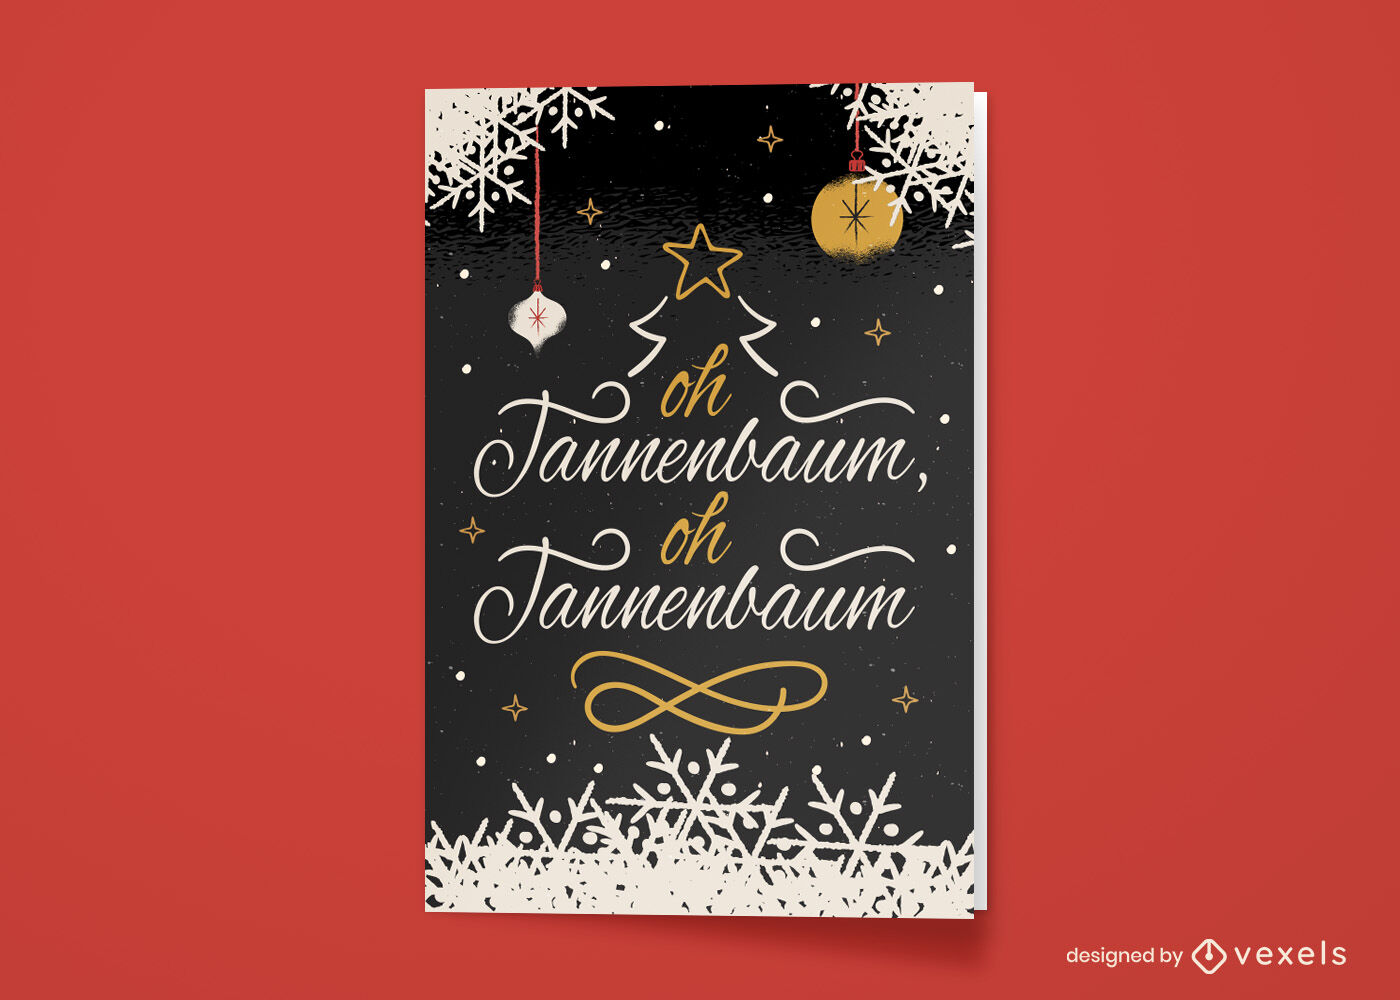 German christmas holiday greeting card